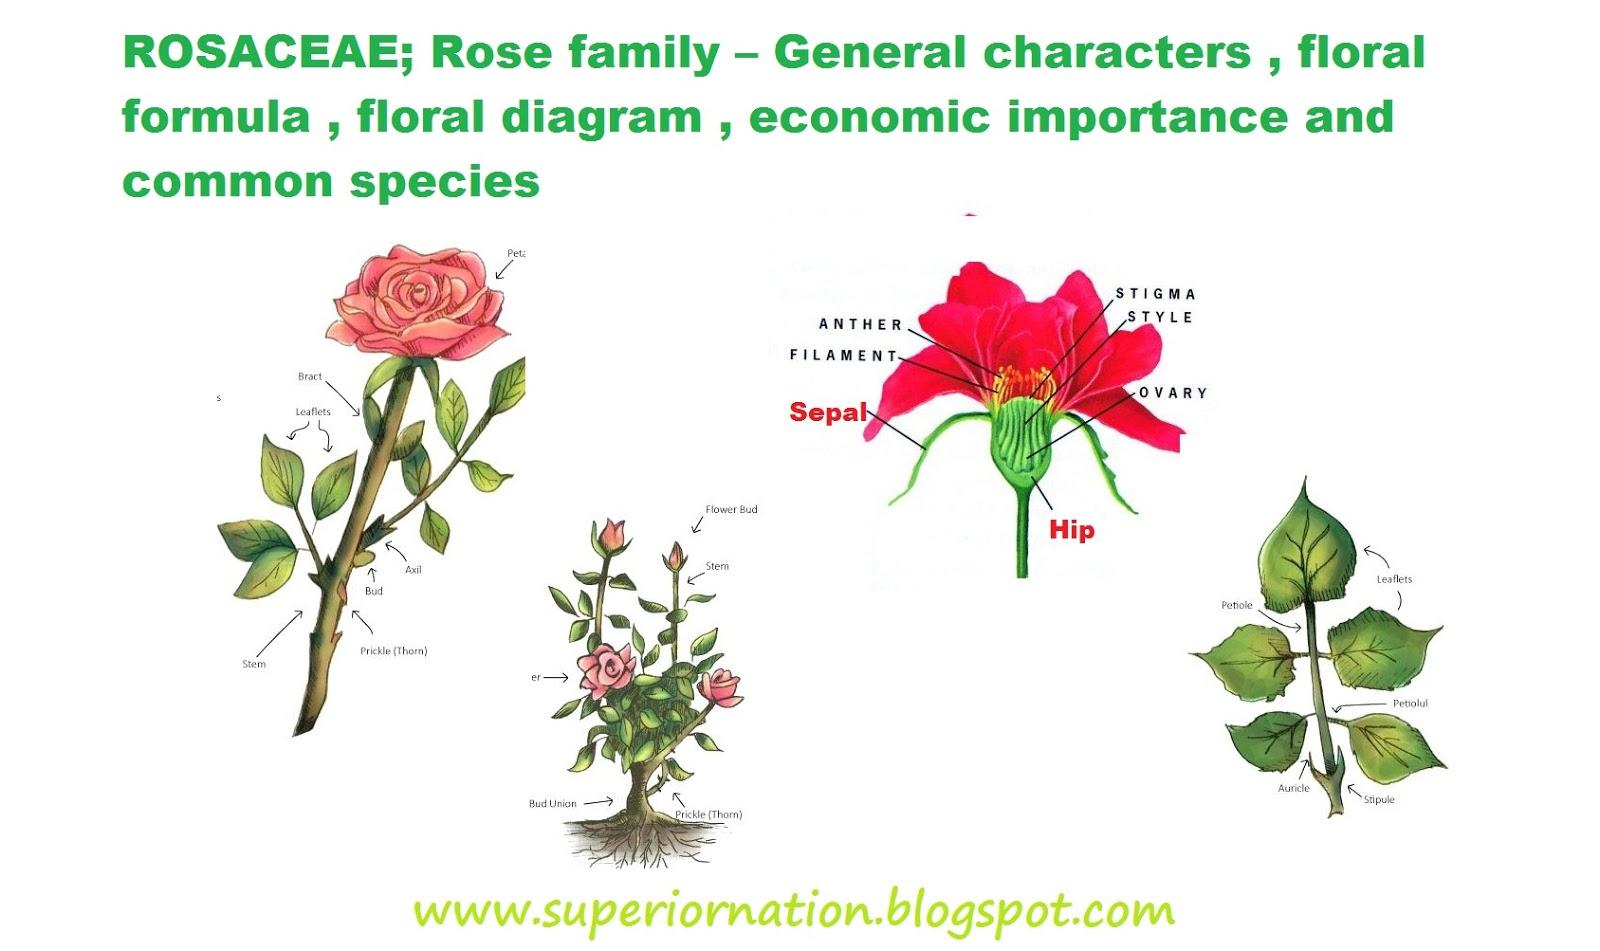 rosaceae rose family general characters floral formula floral rose flower floral diagram rosaceae [ 1600 x 951 Pixel ]